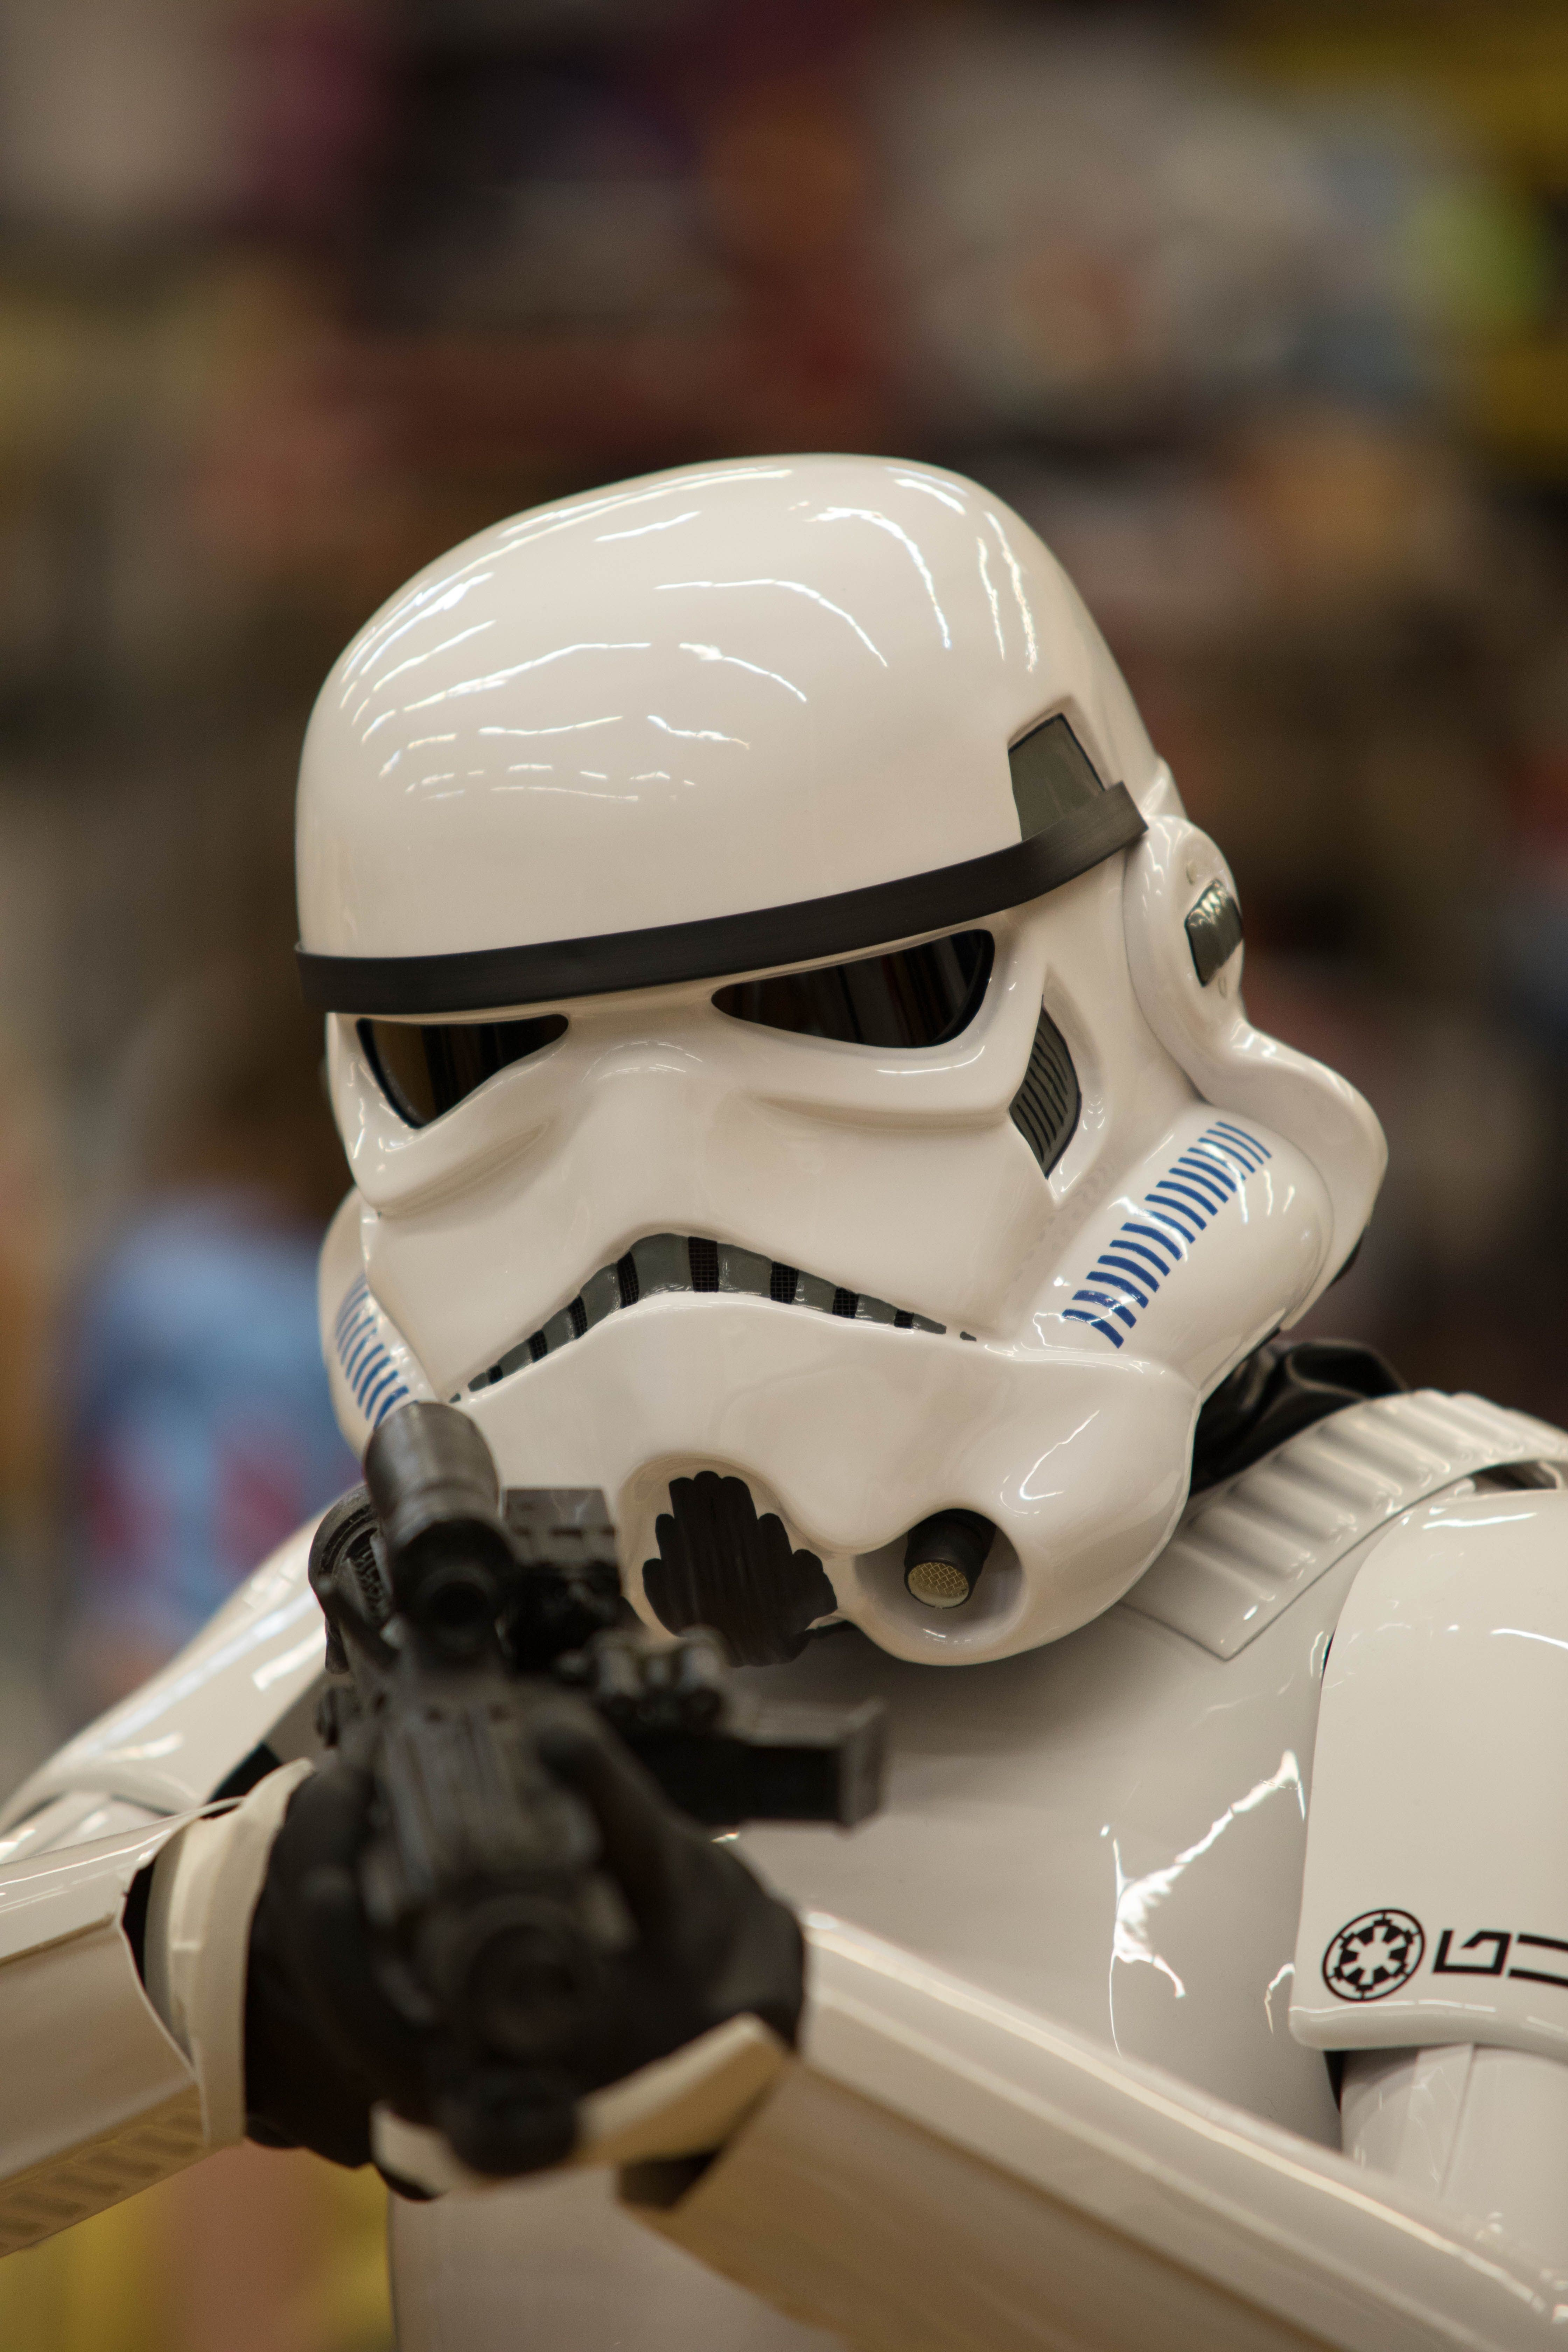 Stormtrooper Papercraft Helmet Stormtrooper Tries to Aim Stormtroopers